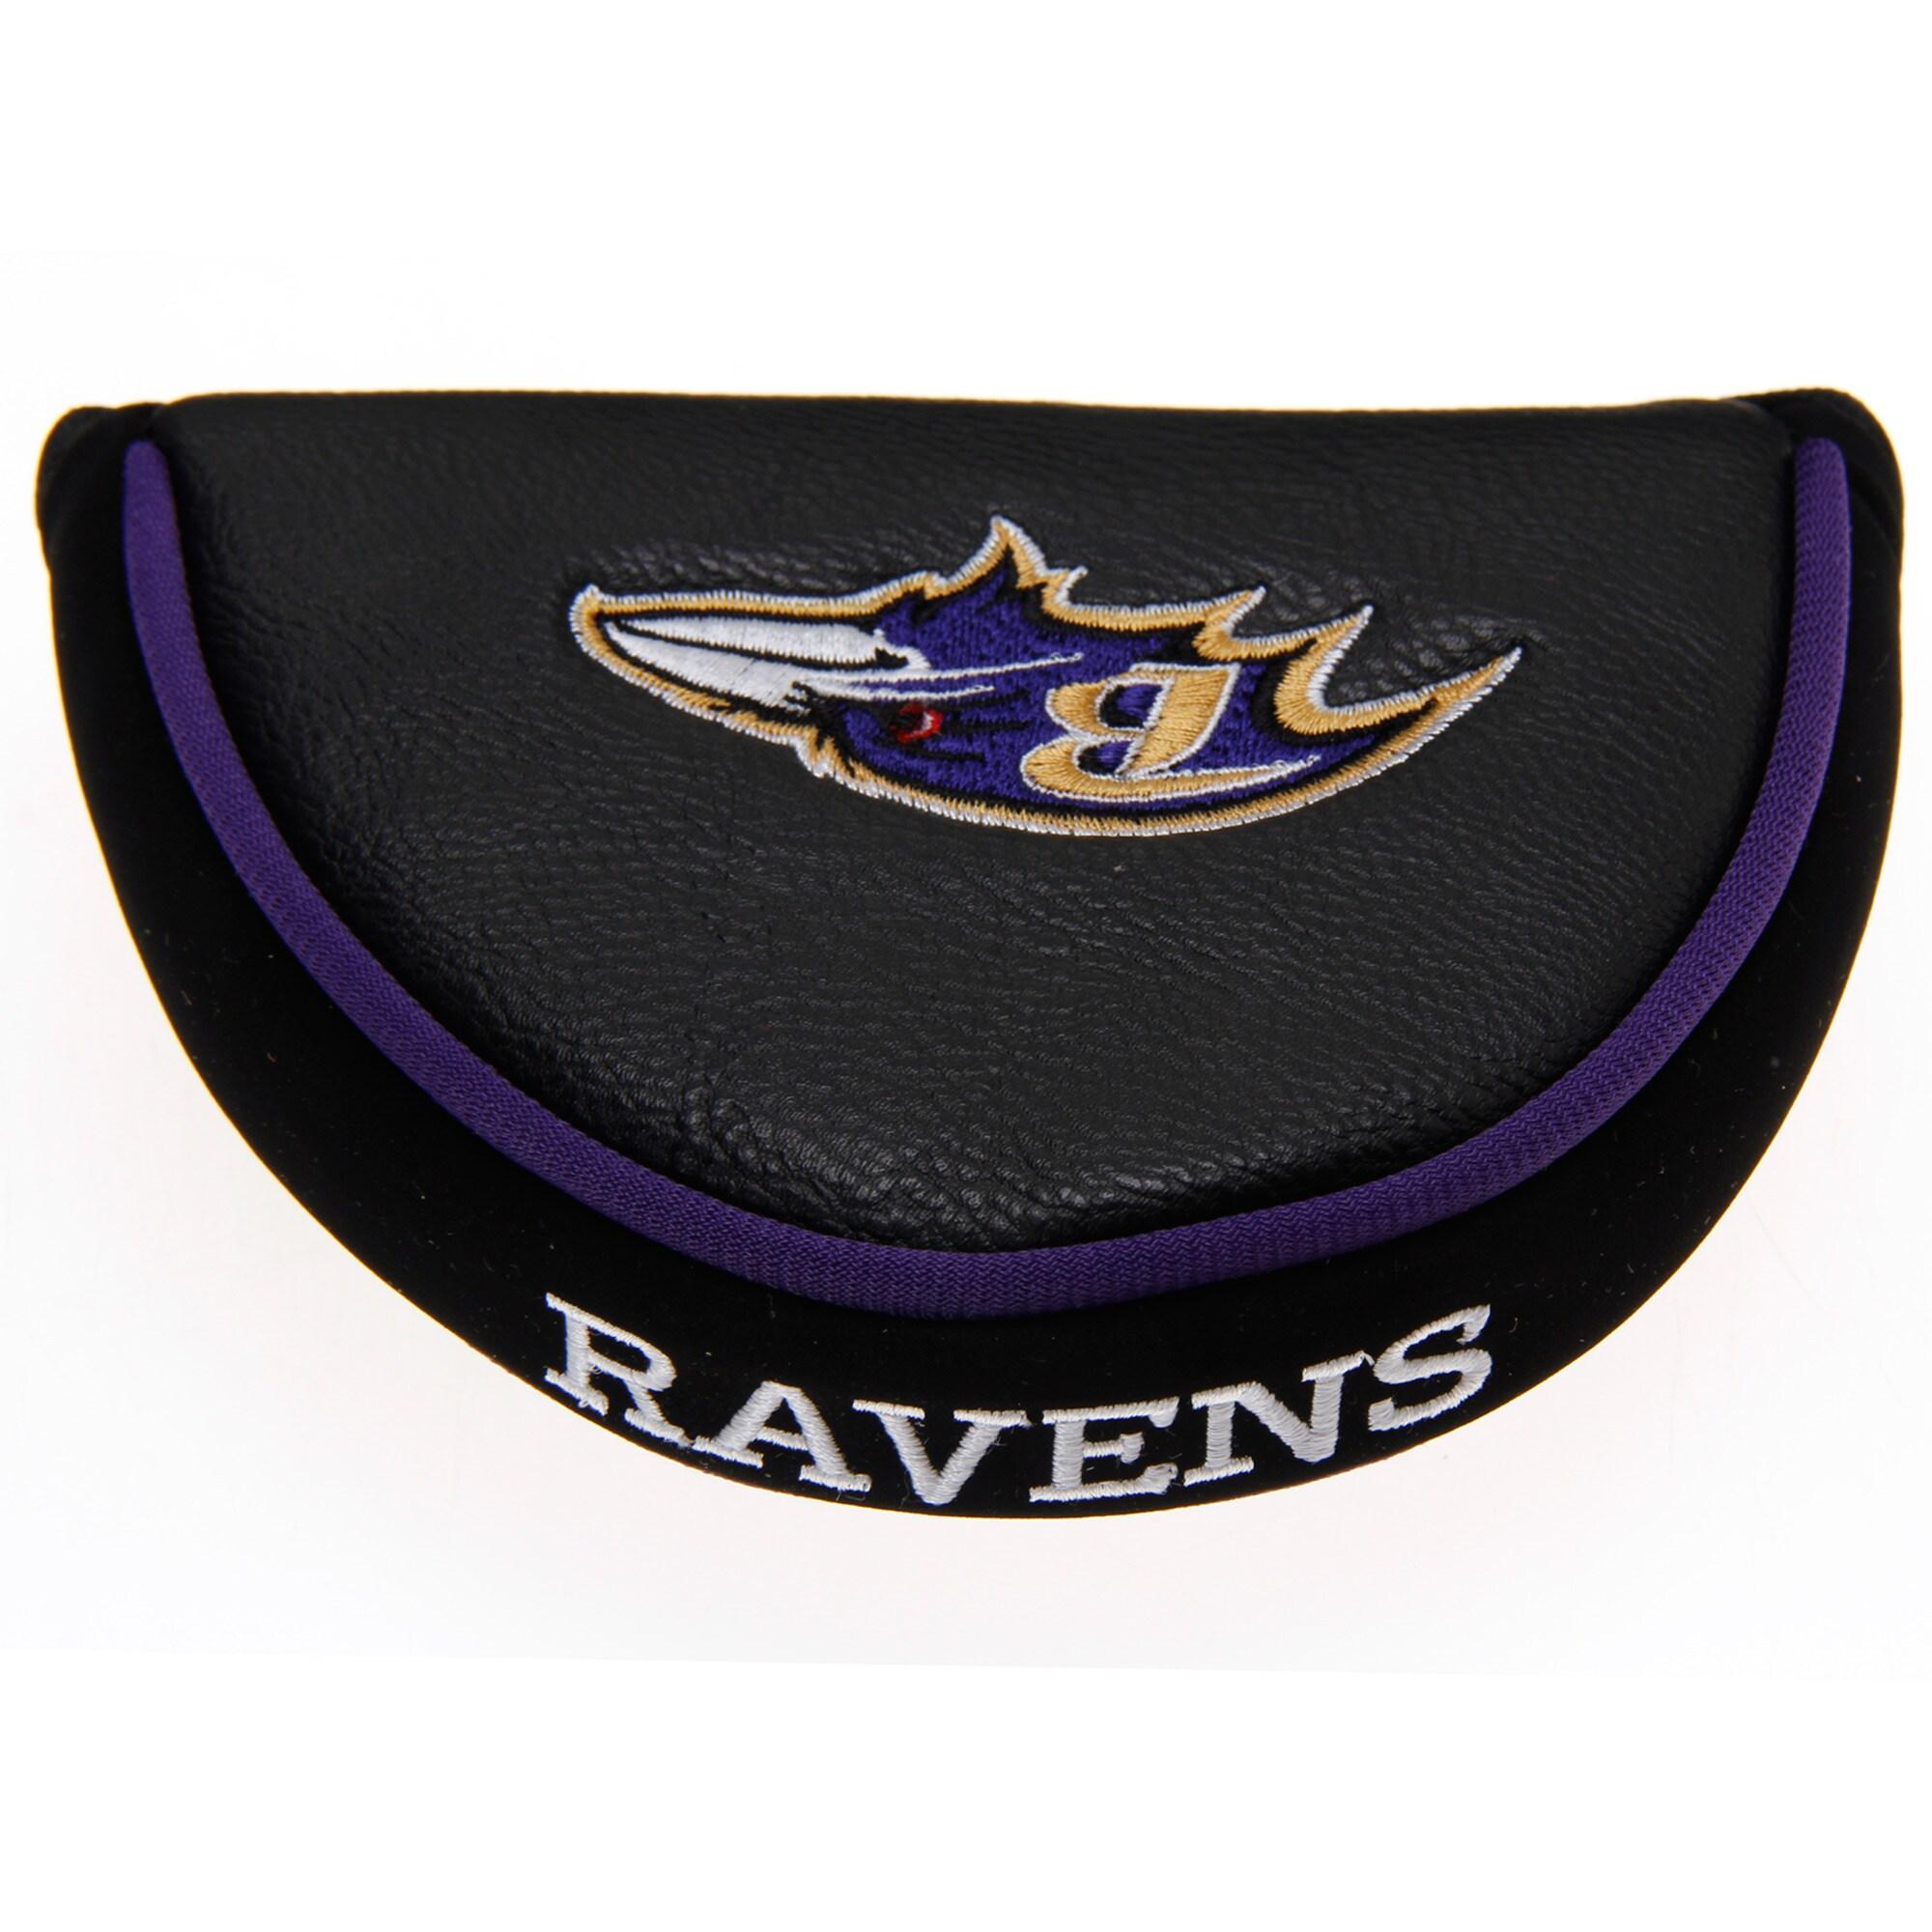 Baltimore Ravens Golf Mallet Putter Cover